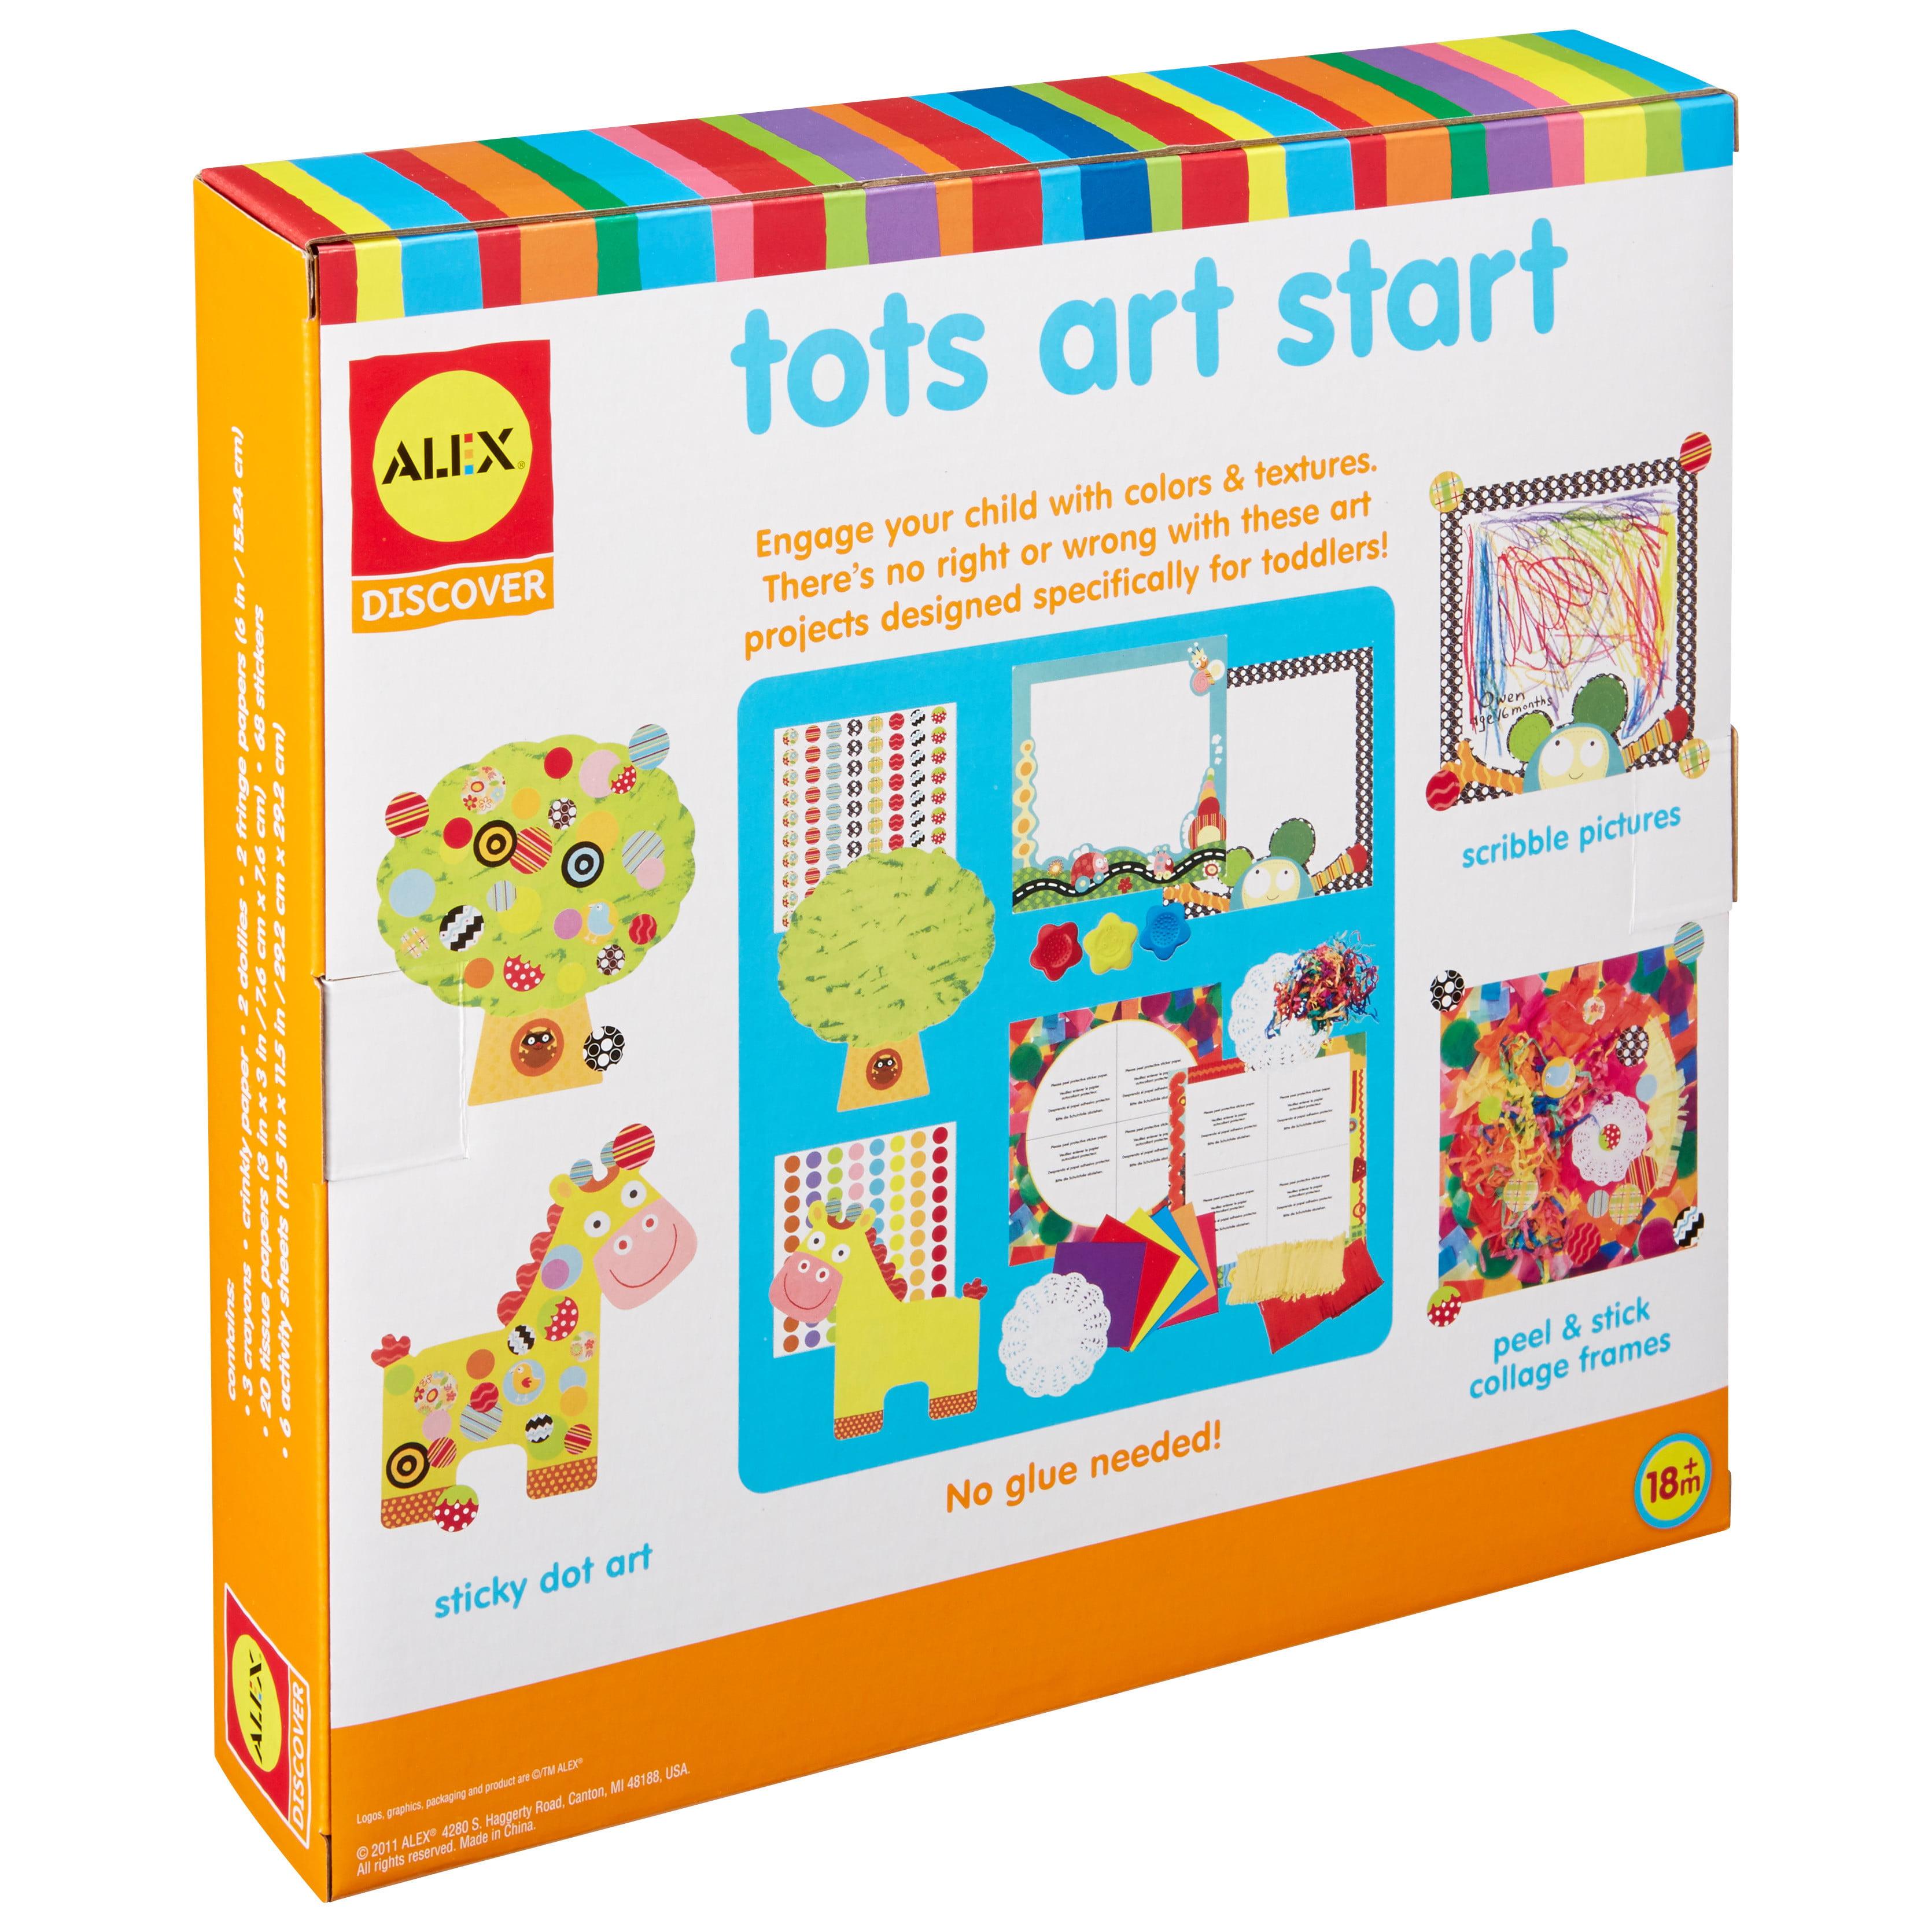 ALEX Discover Tots Art Gallery ALEX Toys 1827